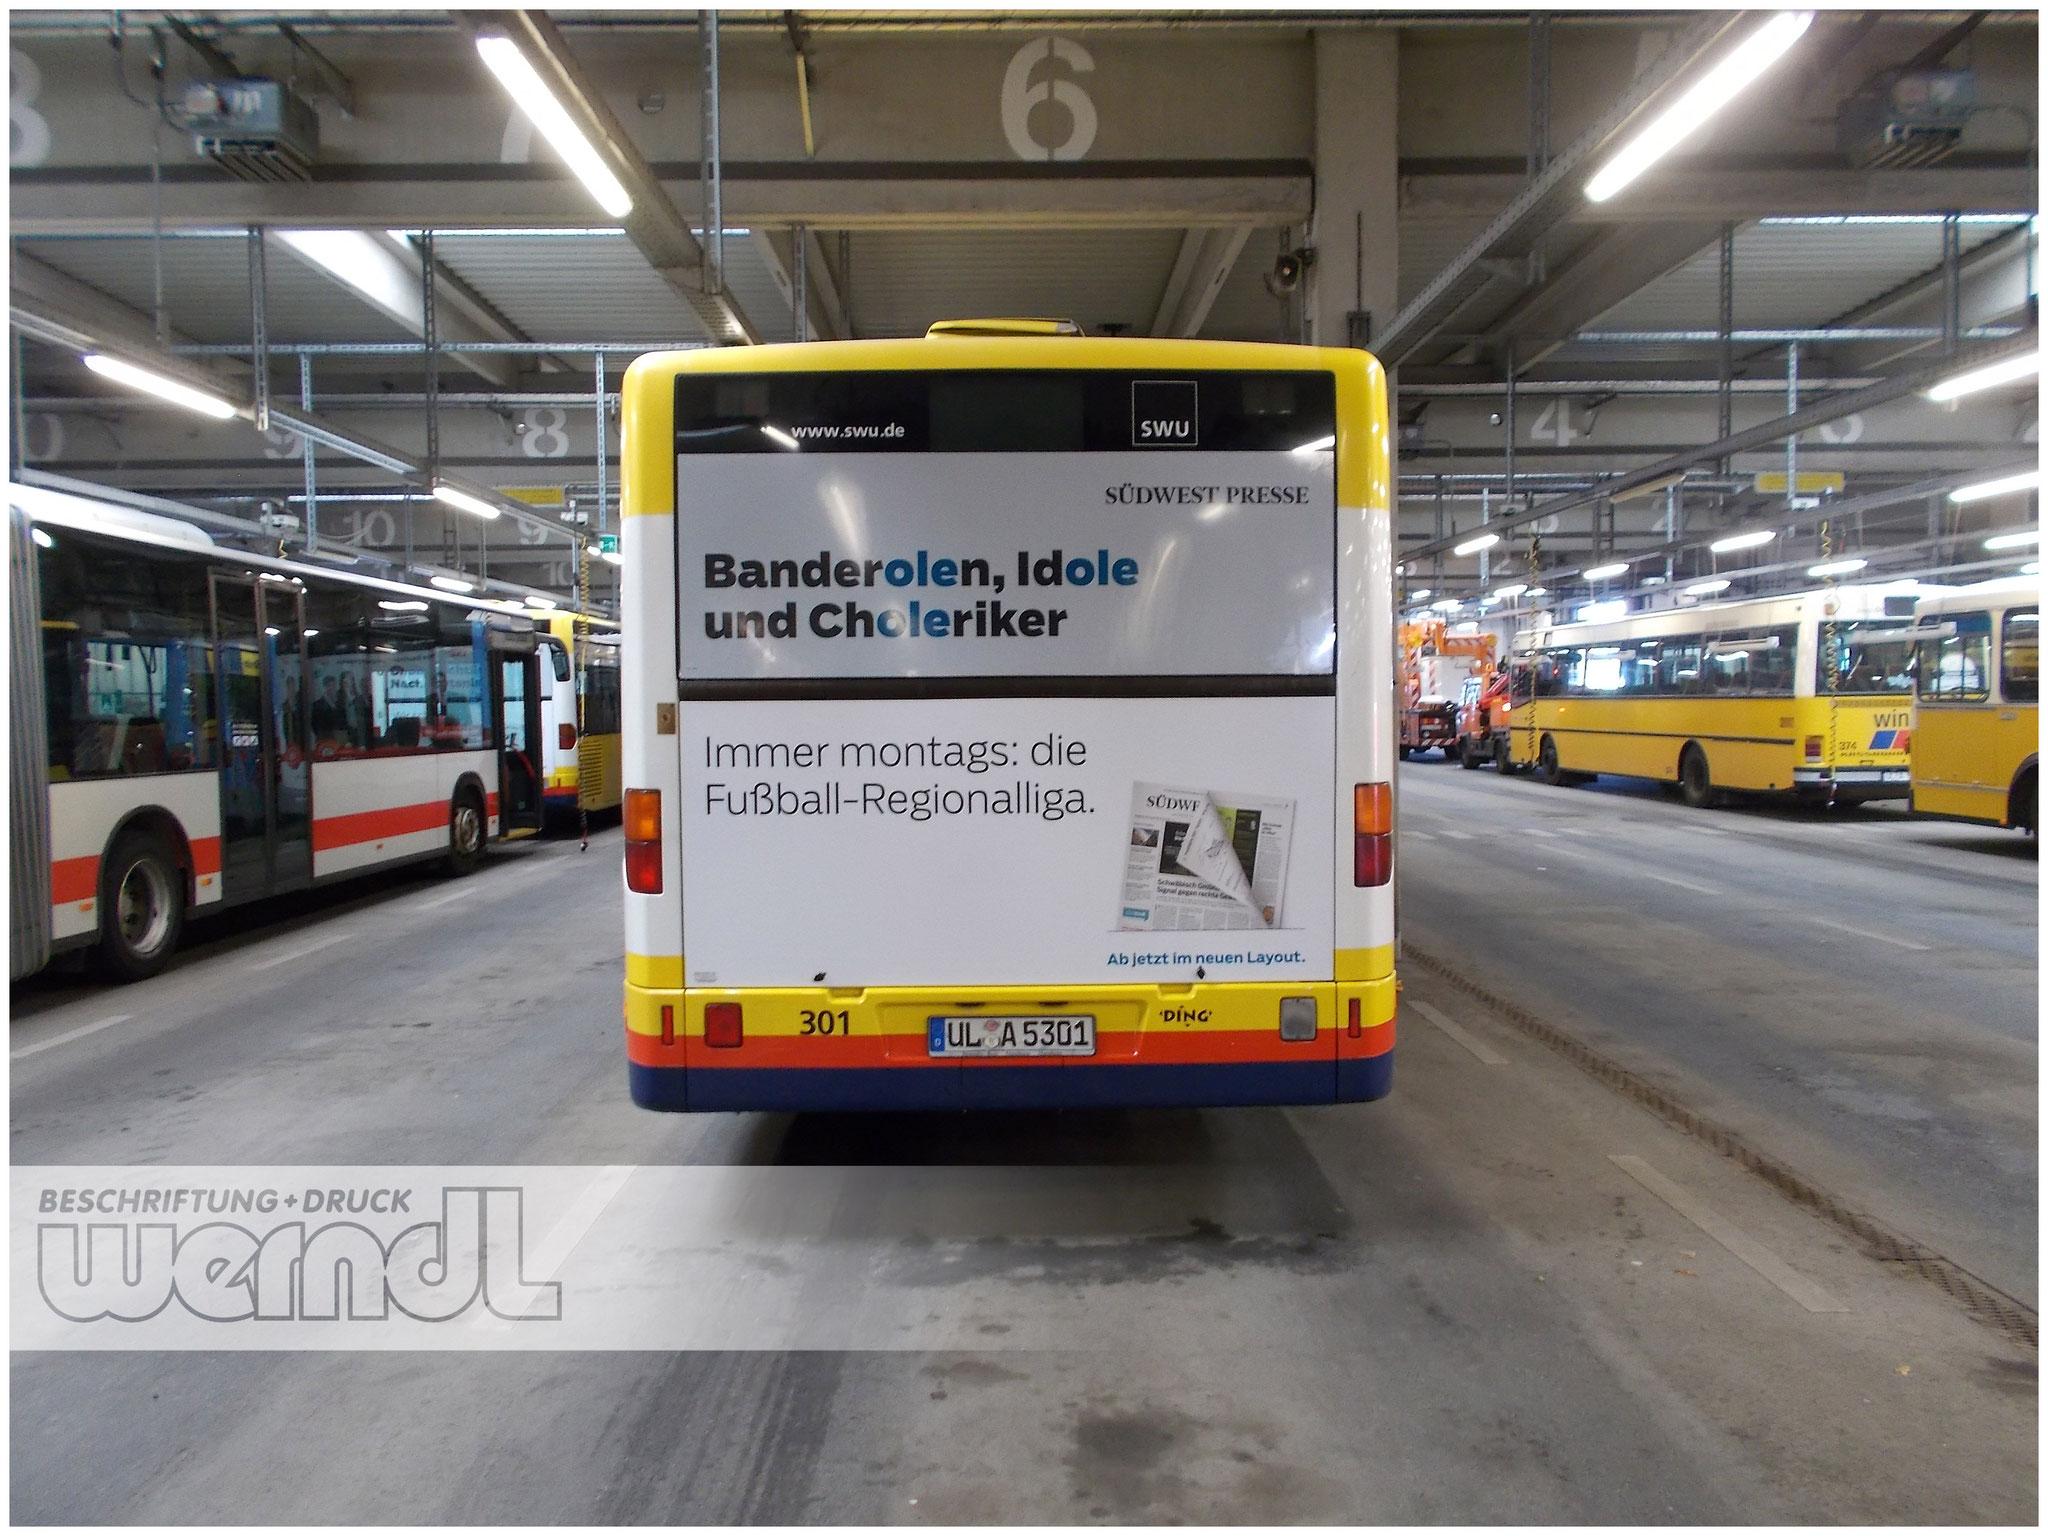 Stadtbus Heckfolierung